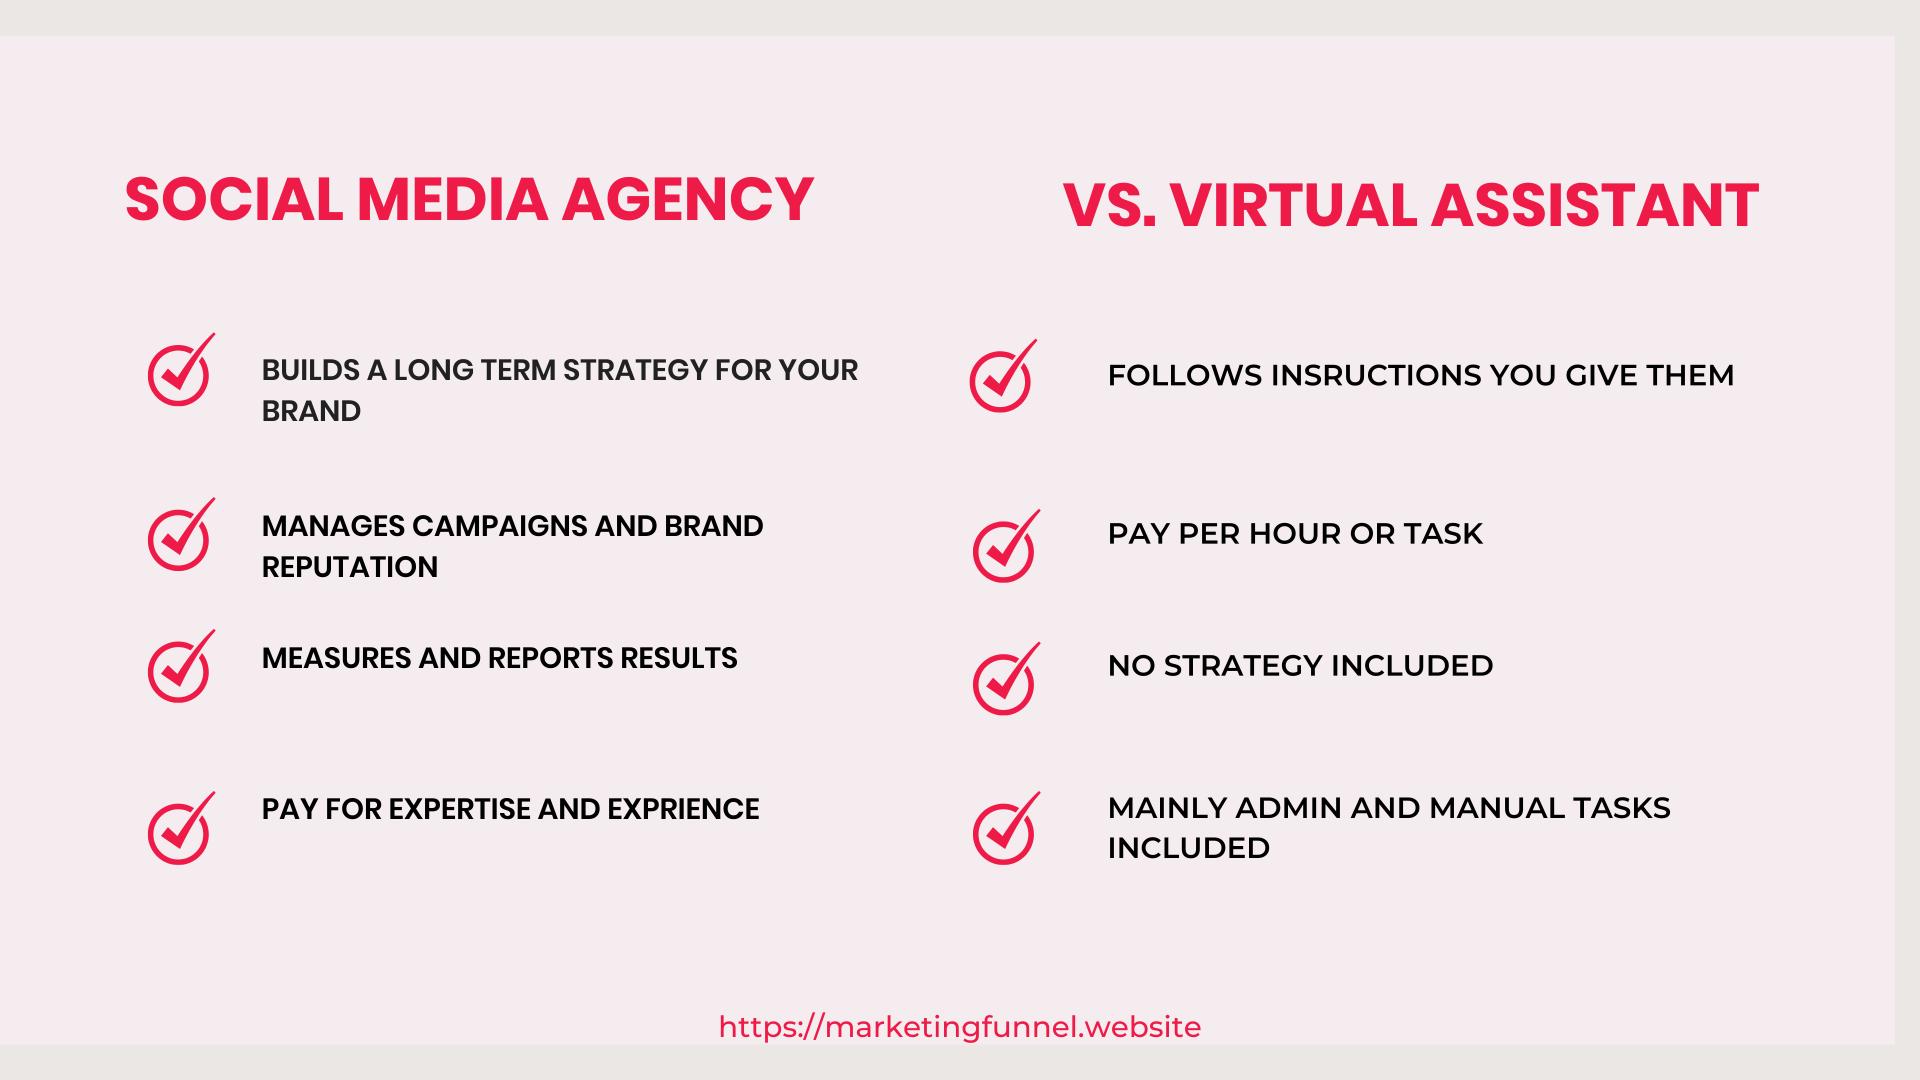 va vs social media agency